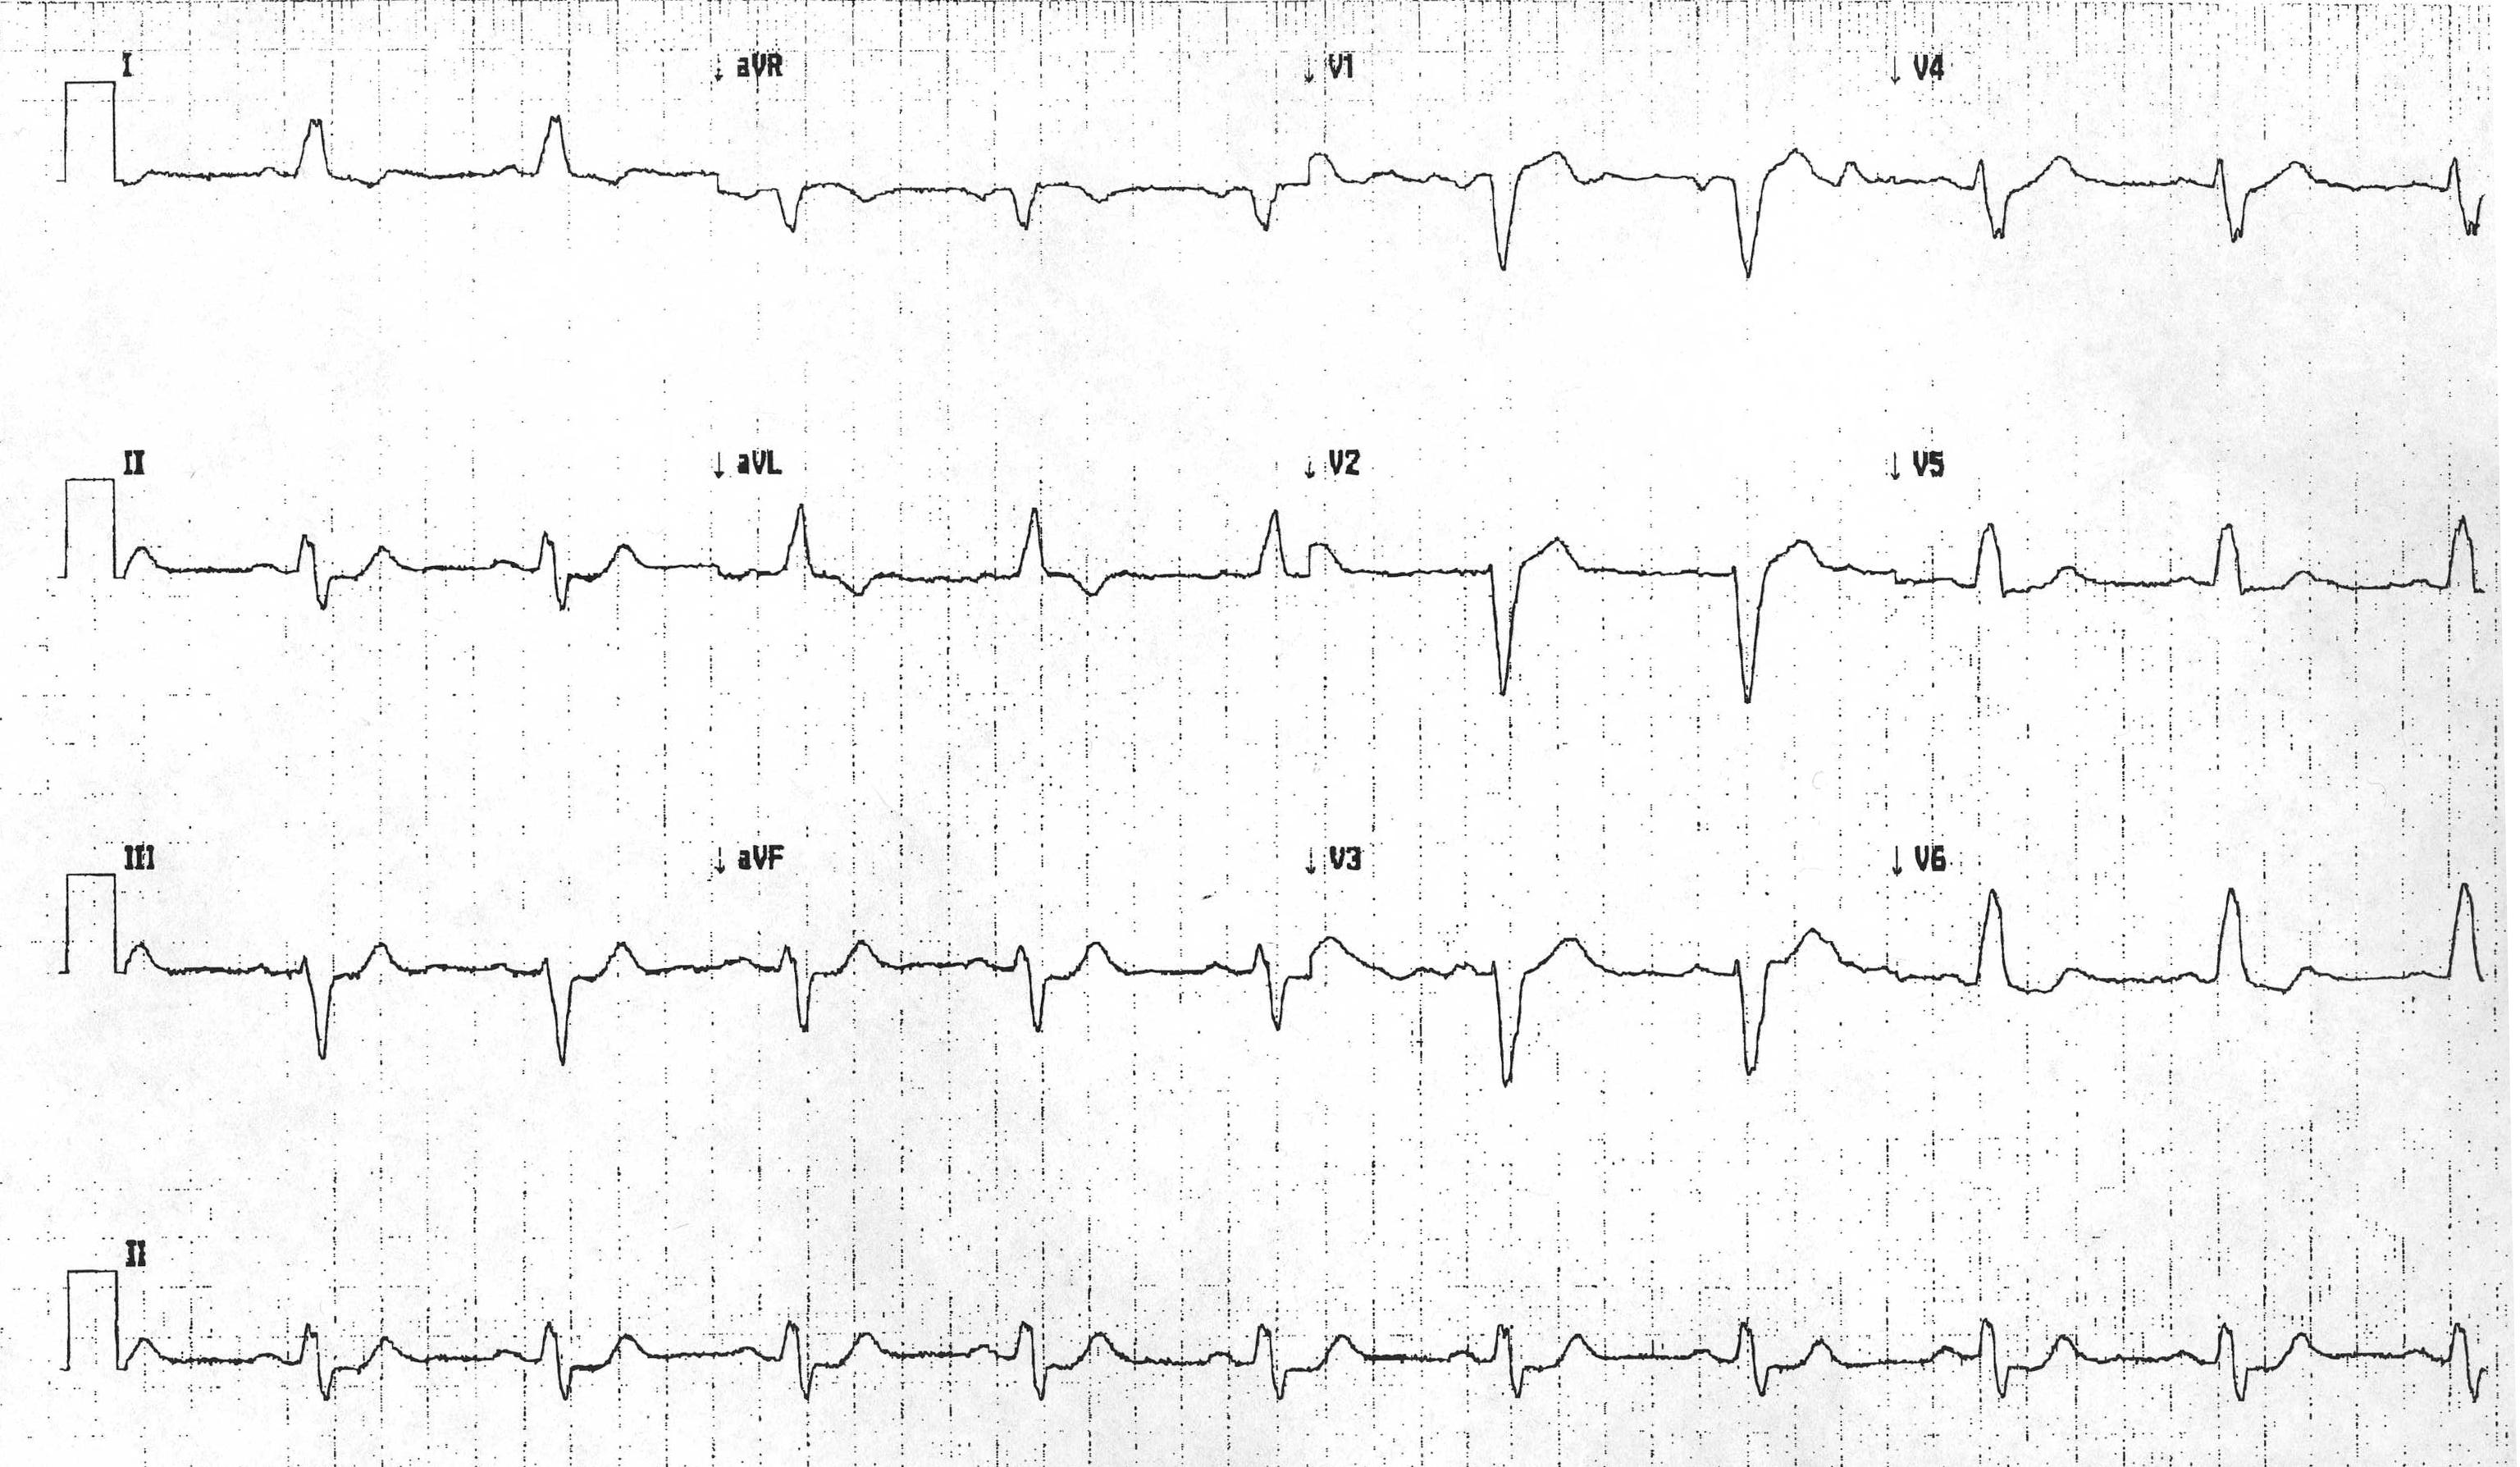 St Elevation Myocardial Infarction Electrocardiogram